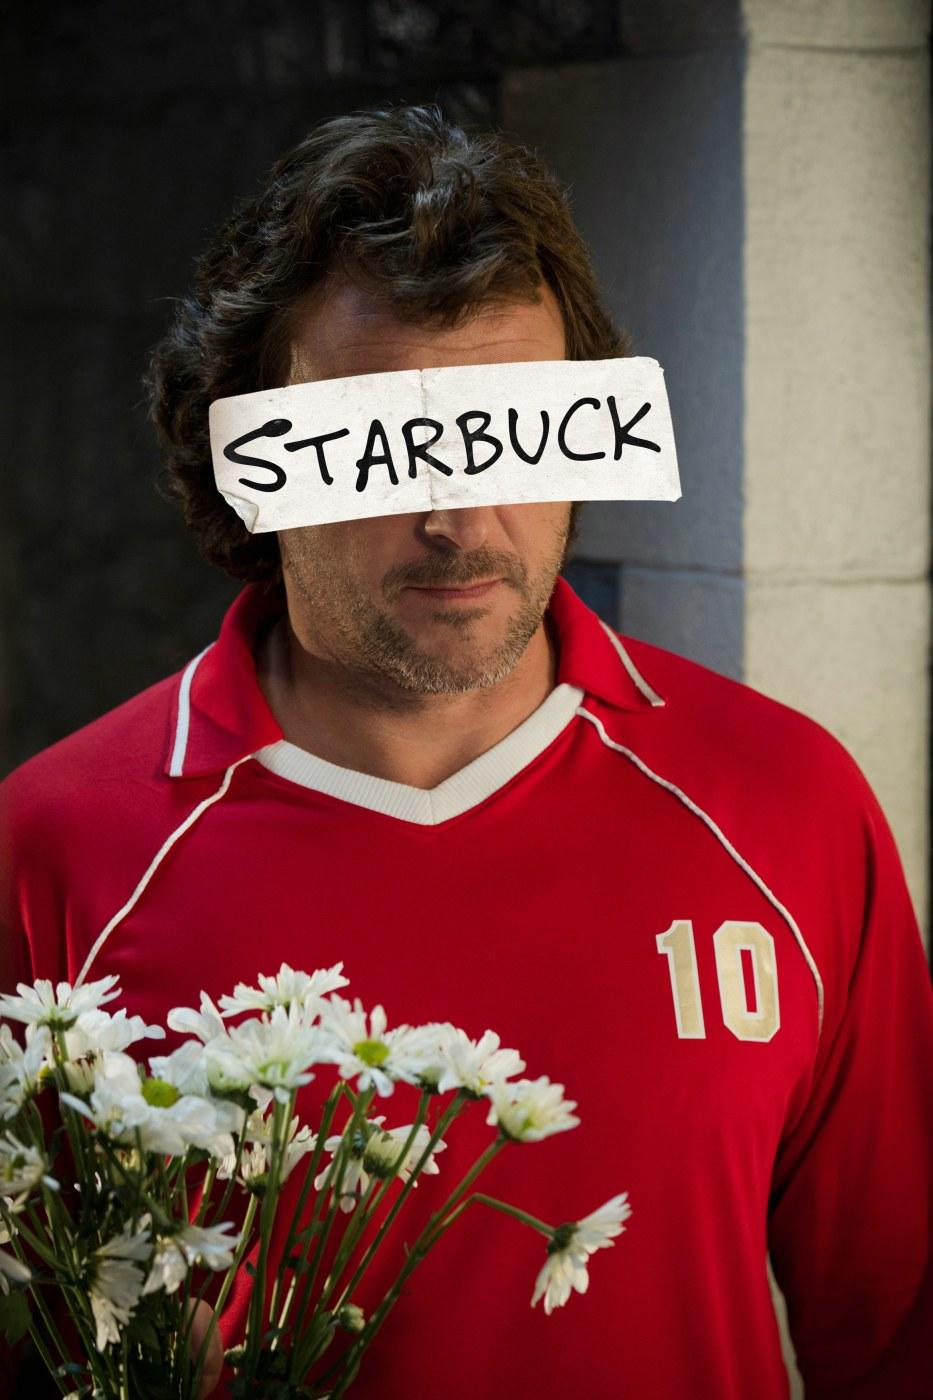 Starbuck - Bild 3